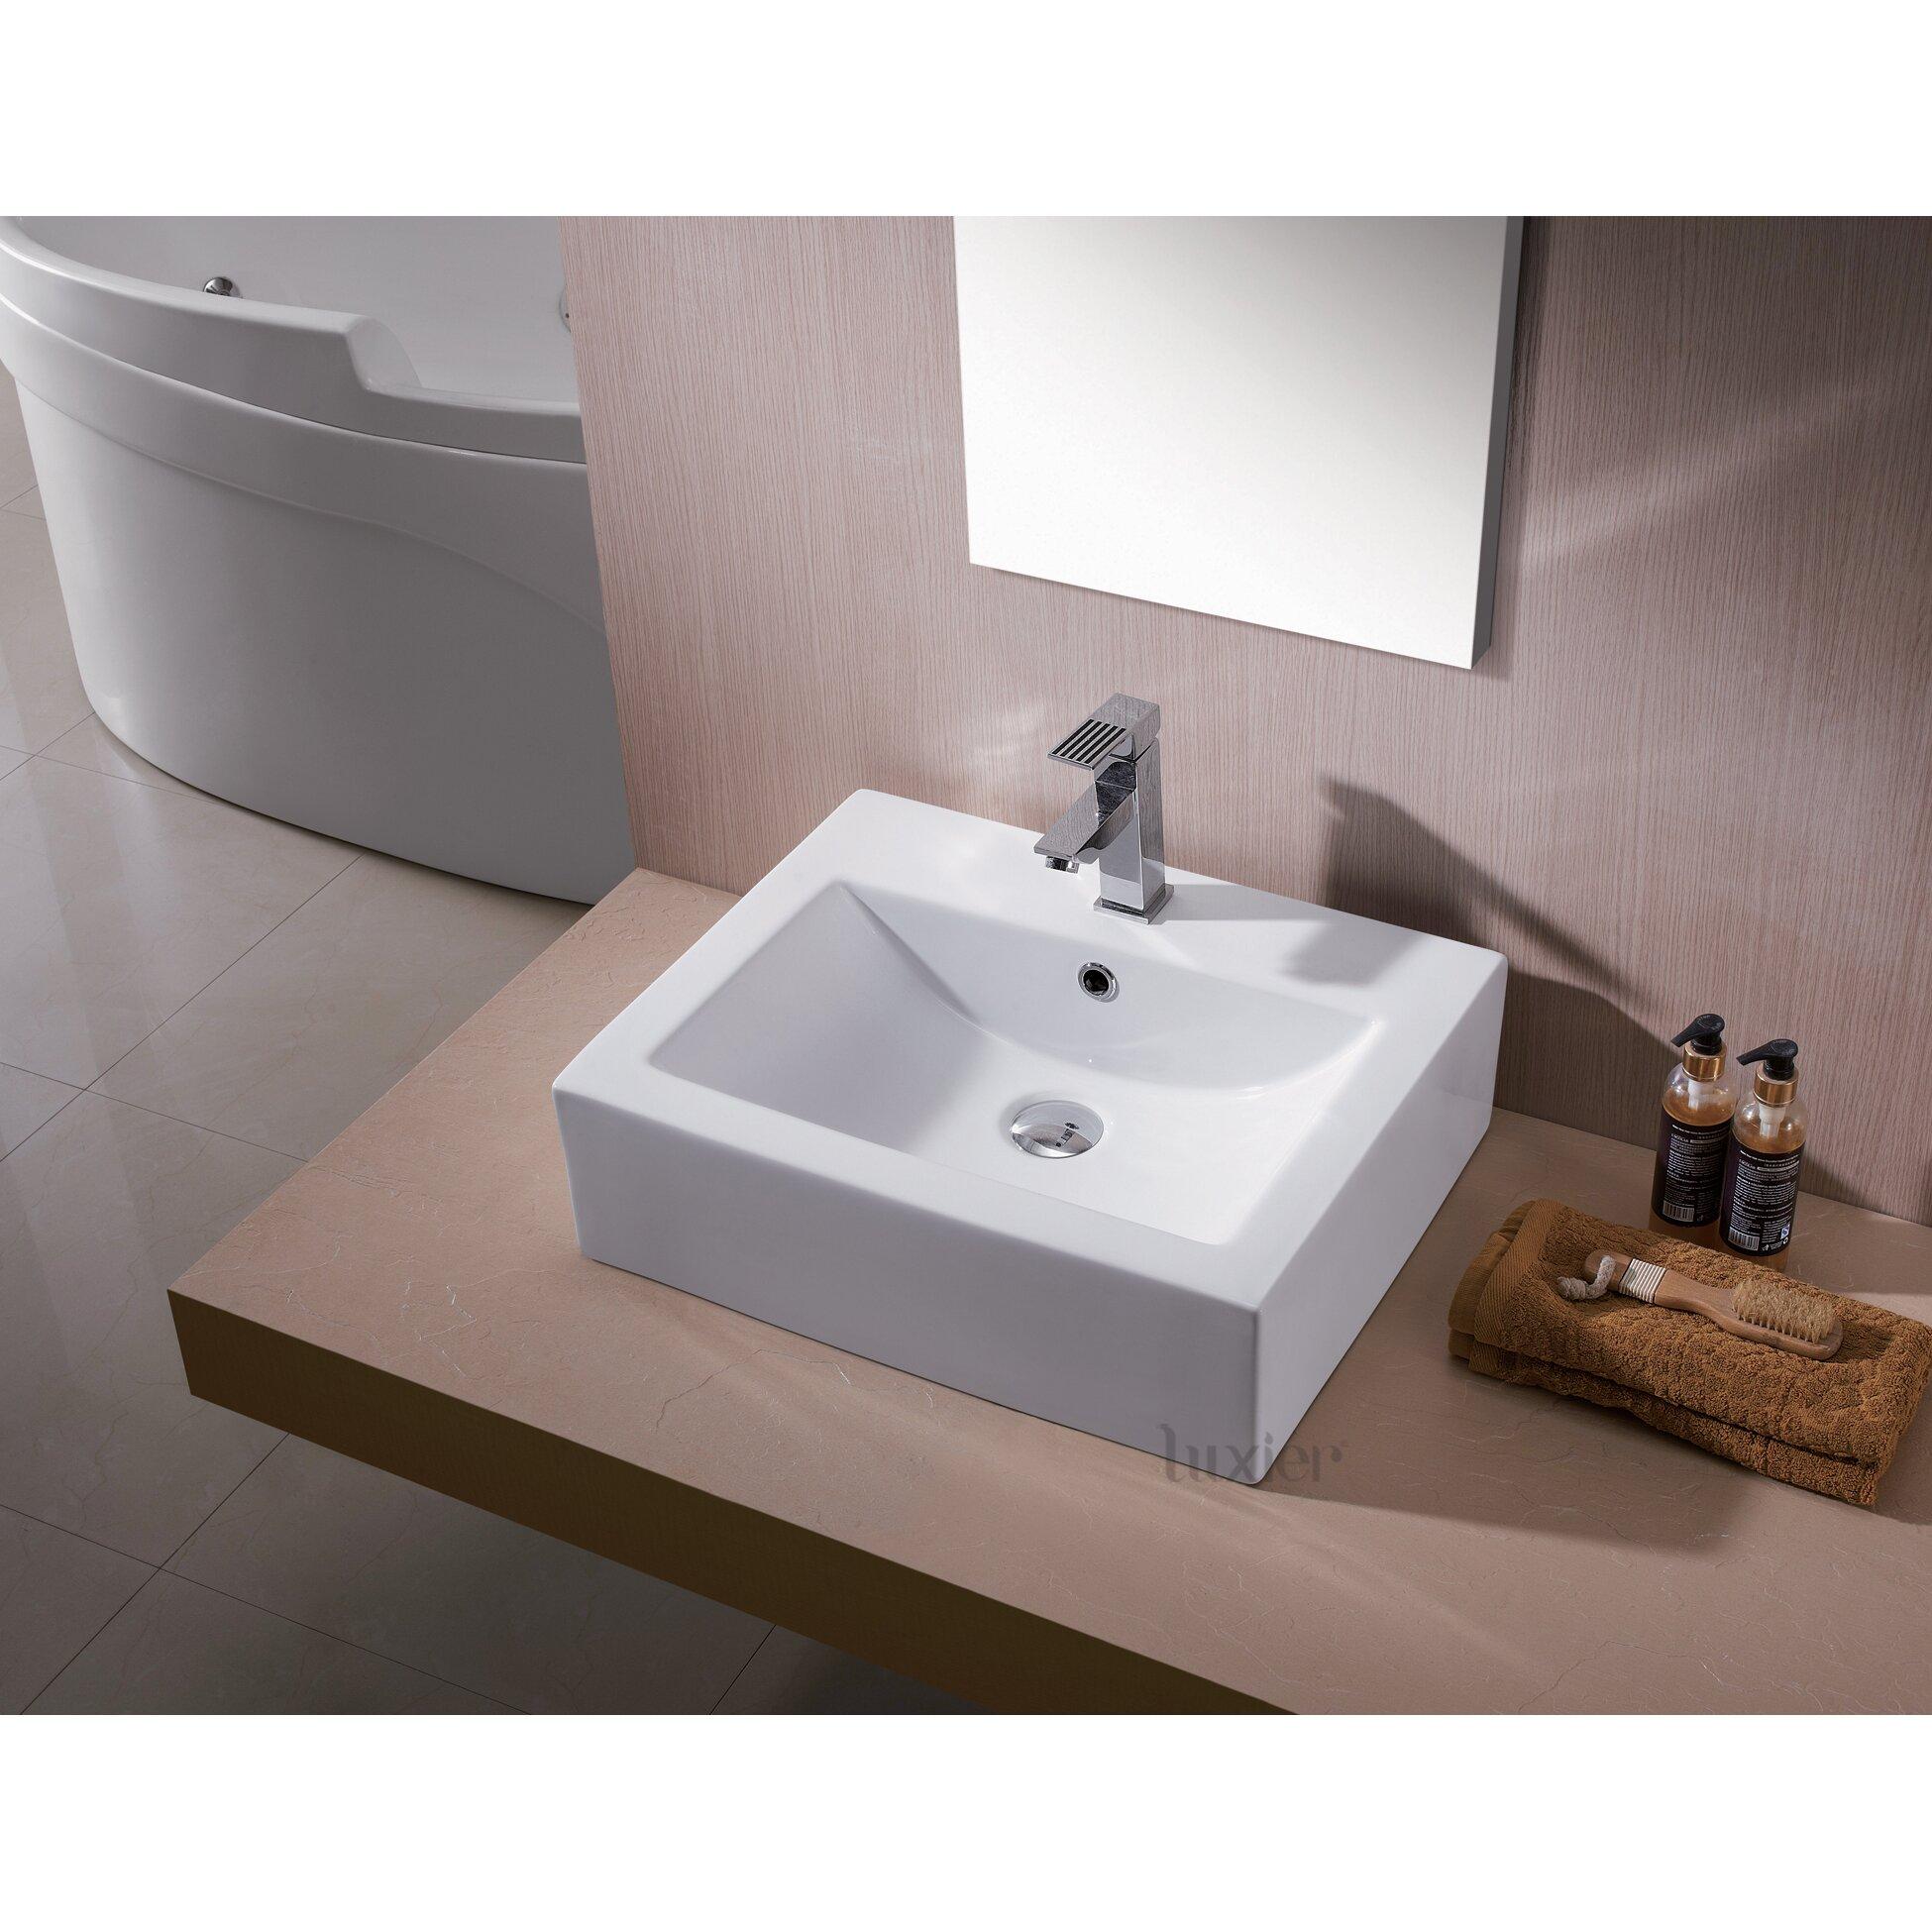 Luxier L-003 Bathroom Porcelain Ceramic Vessel Vanity Sink Art Basin ...